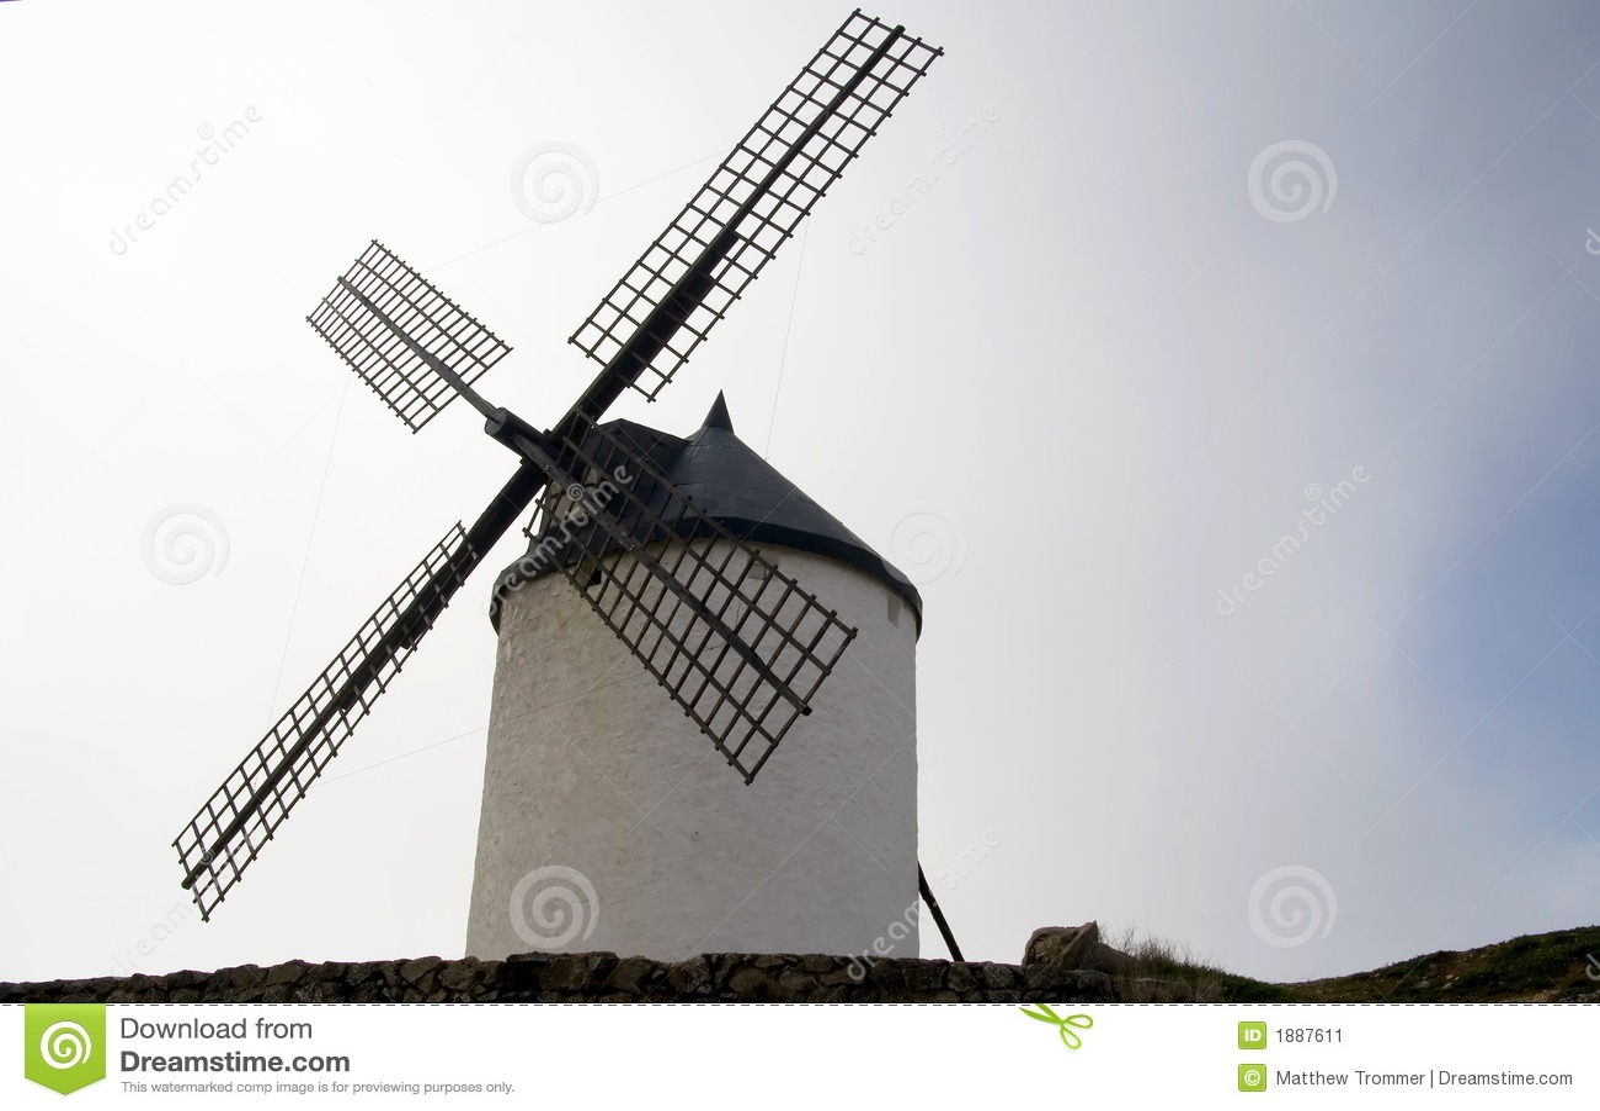 Moulin à vent espagnol